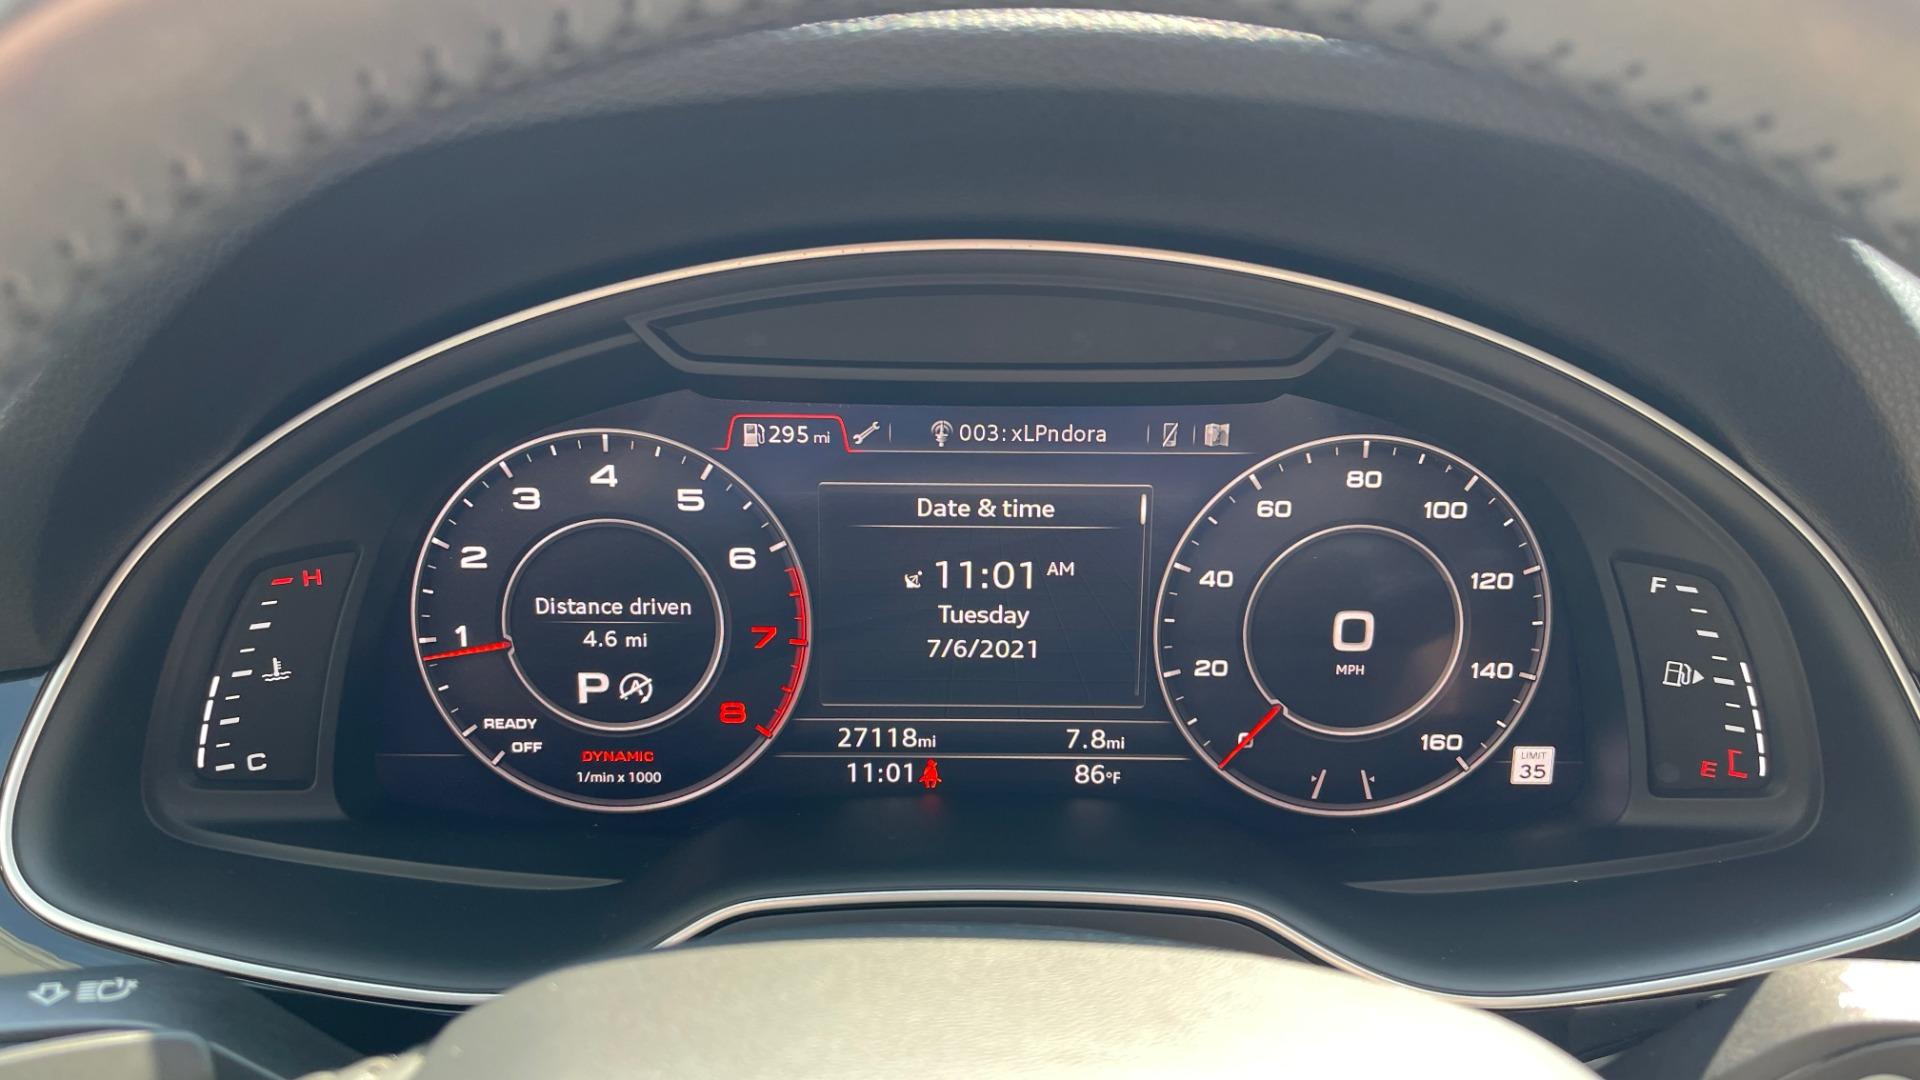 Used 2018 Audi Q7 PRESTIGE TIPTRONIC / NAV / SUNROOF / ADAPTIVE PKG / DRVR ASST / CLD WTHR /  for sale $49,995 at Formula Imports in Charlotte NC 28227 38